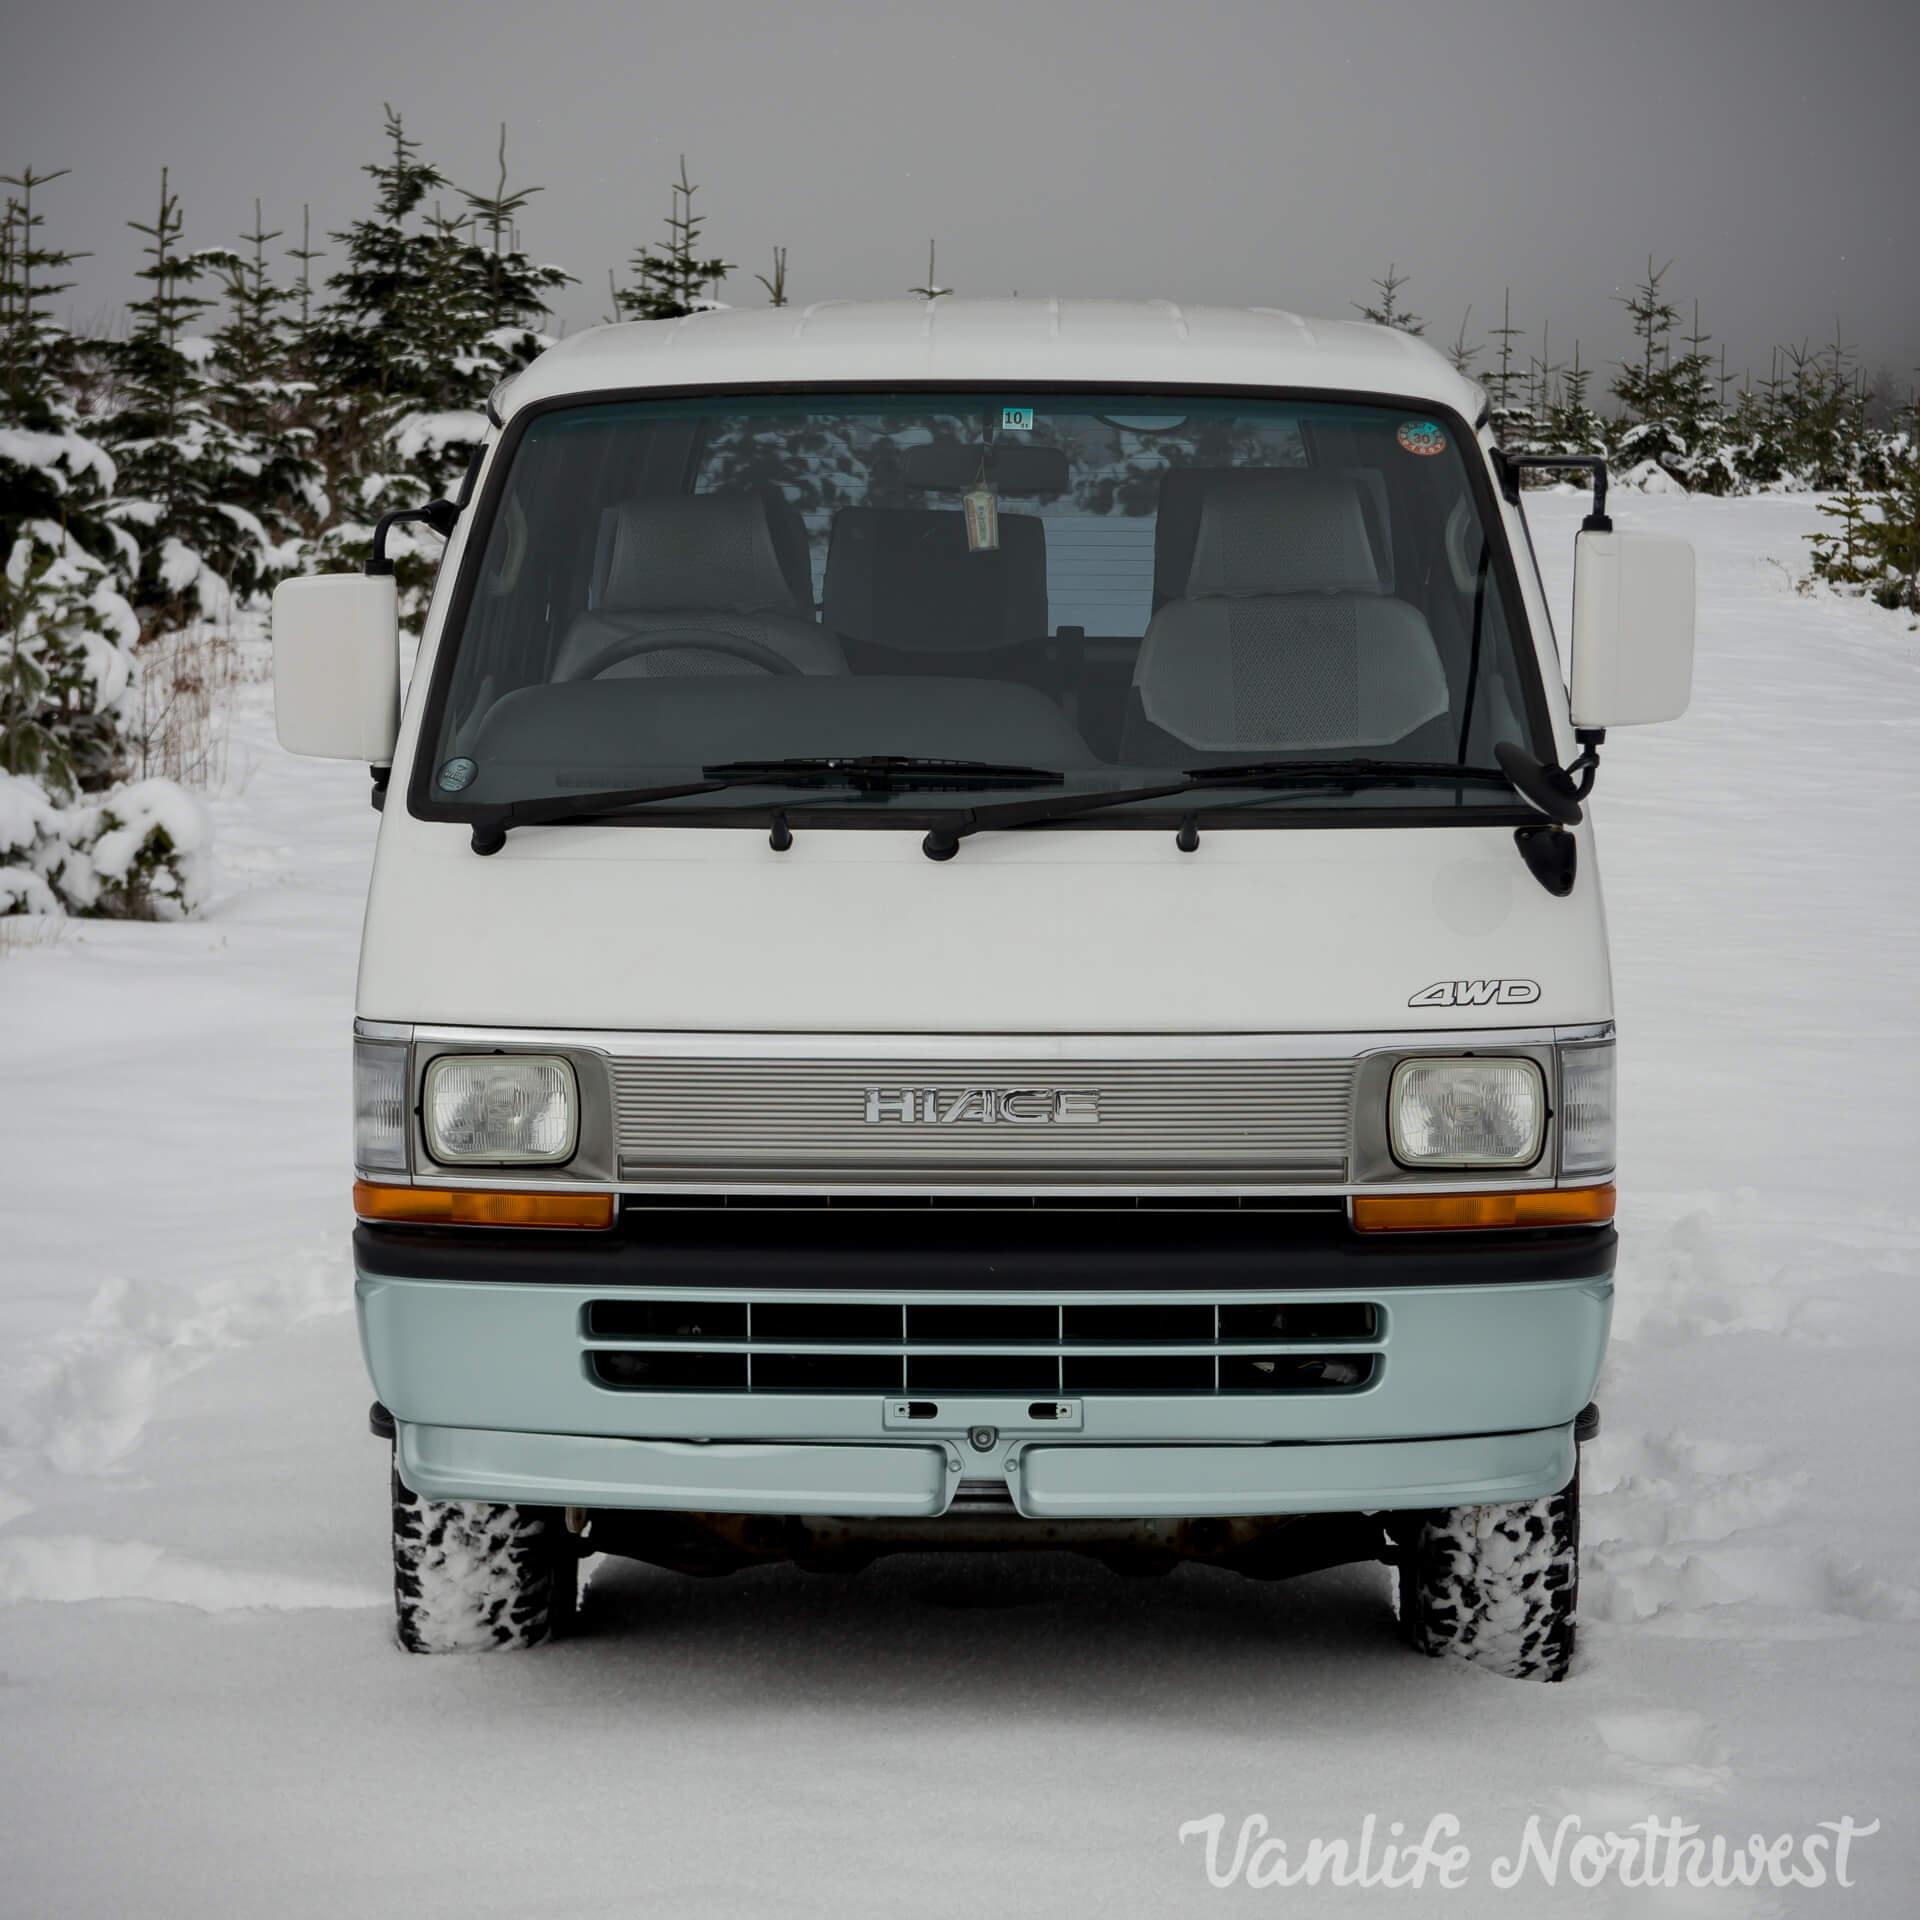 ToyotaHiaceLH119-JoeH-20.jpg